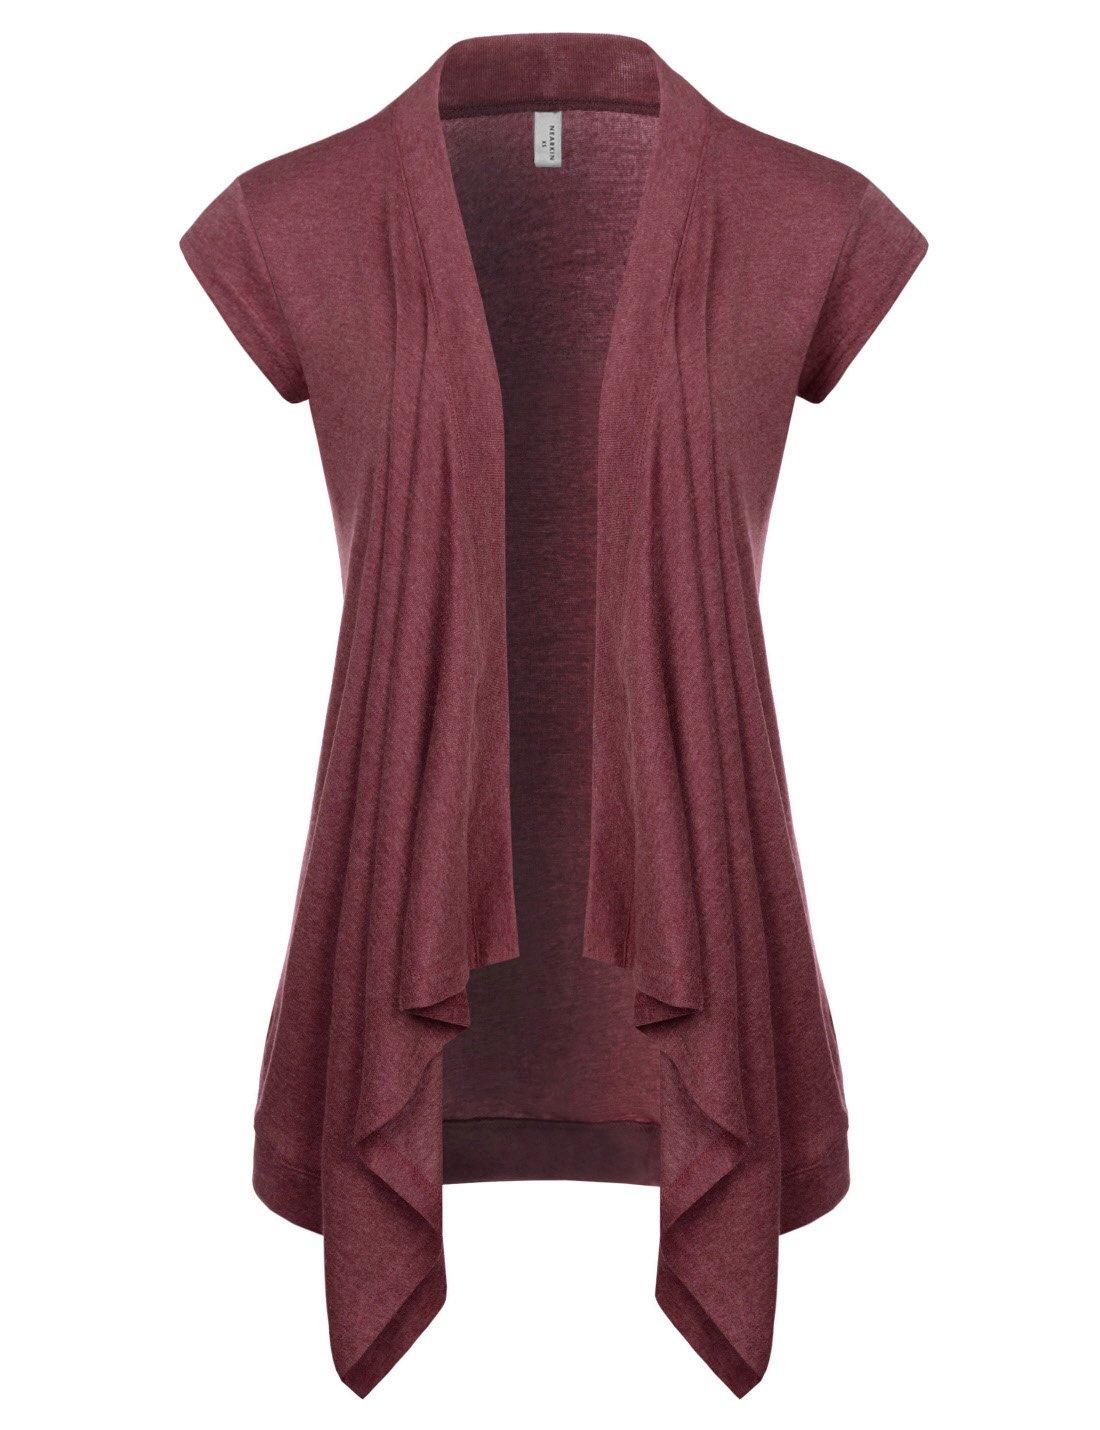 NEARKIN (NKNKWCD692S) Women Daily Casual Slim Cut Look Short Sleeve Open Front Cardigans WINE US M(Tag size L)